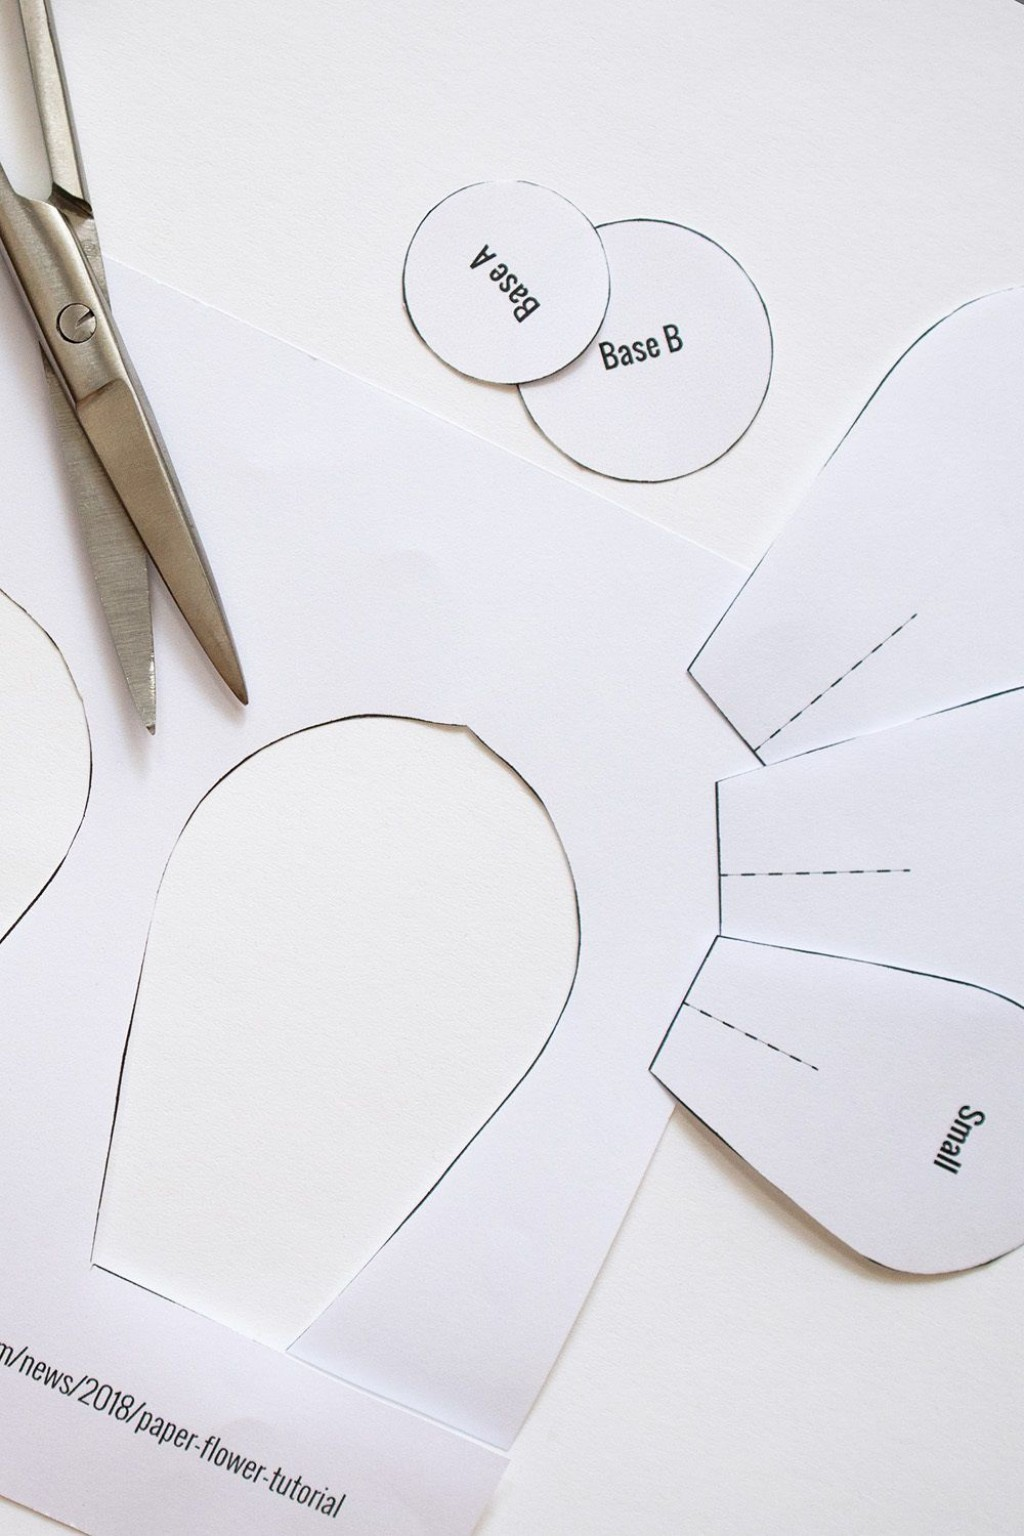 009 Dreaded Free Printable Diy Paper Flower Template Image  TemplatesLarge